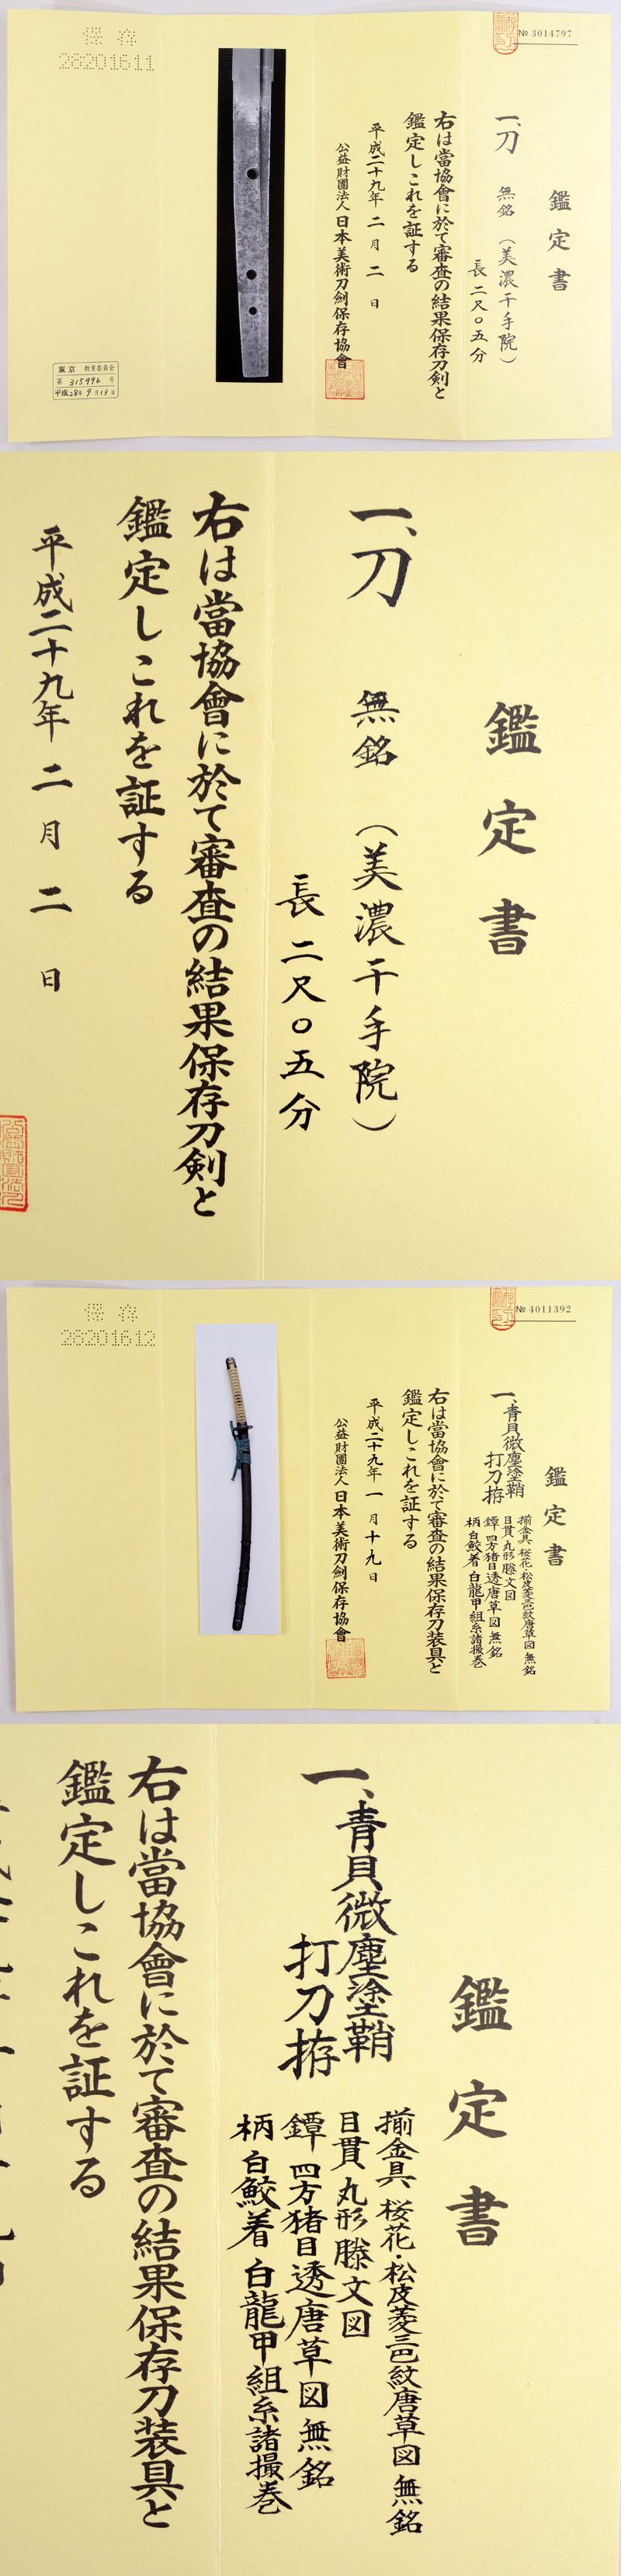 無銘(美濃千手院) Picture of Certificate